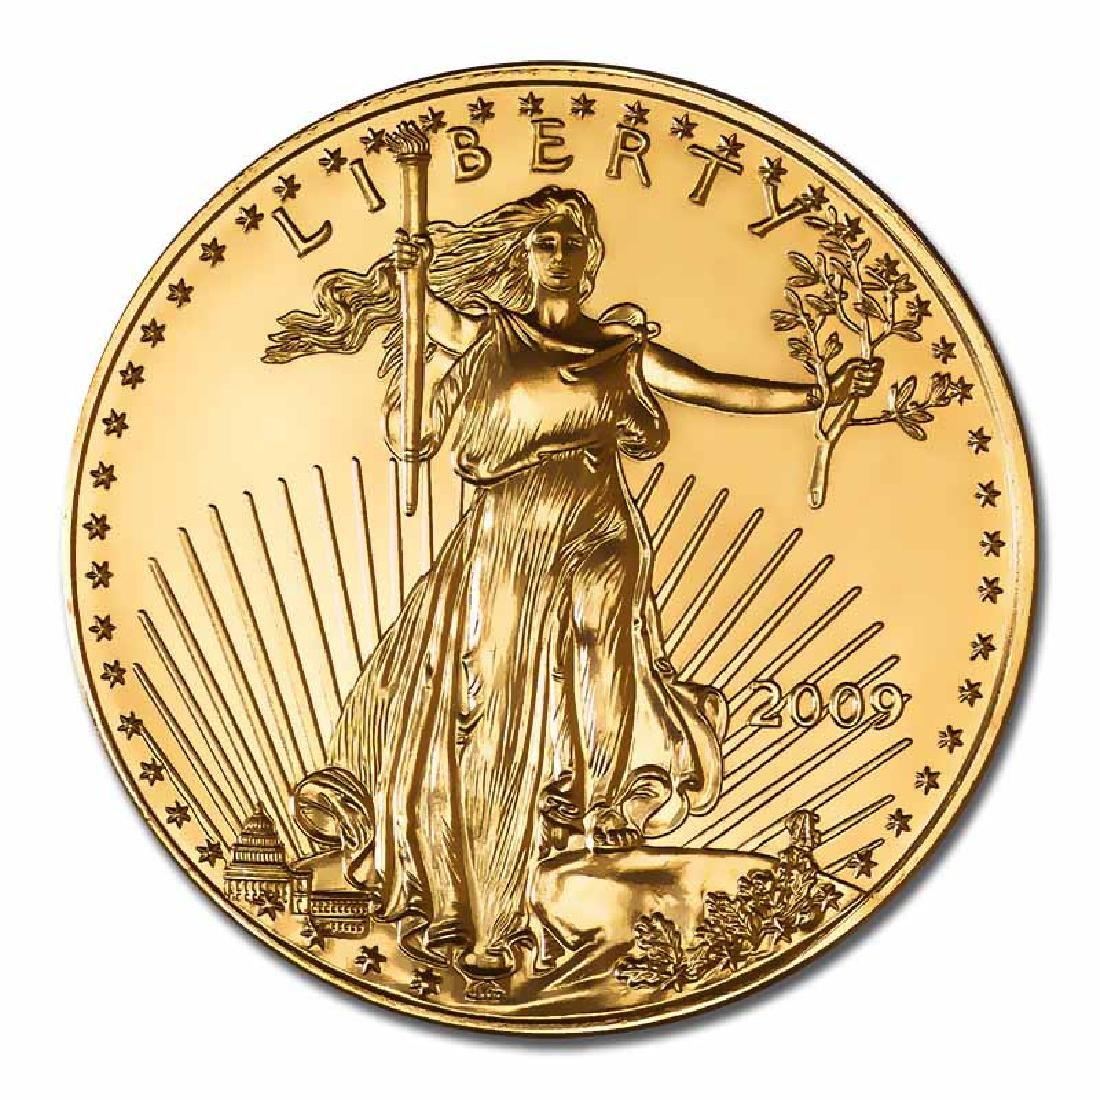 2009 American Gold Eagle 1 oz Uncirculated